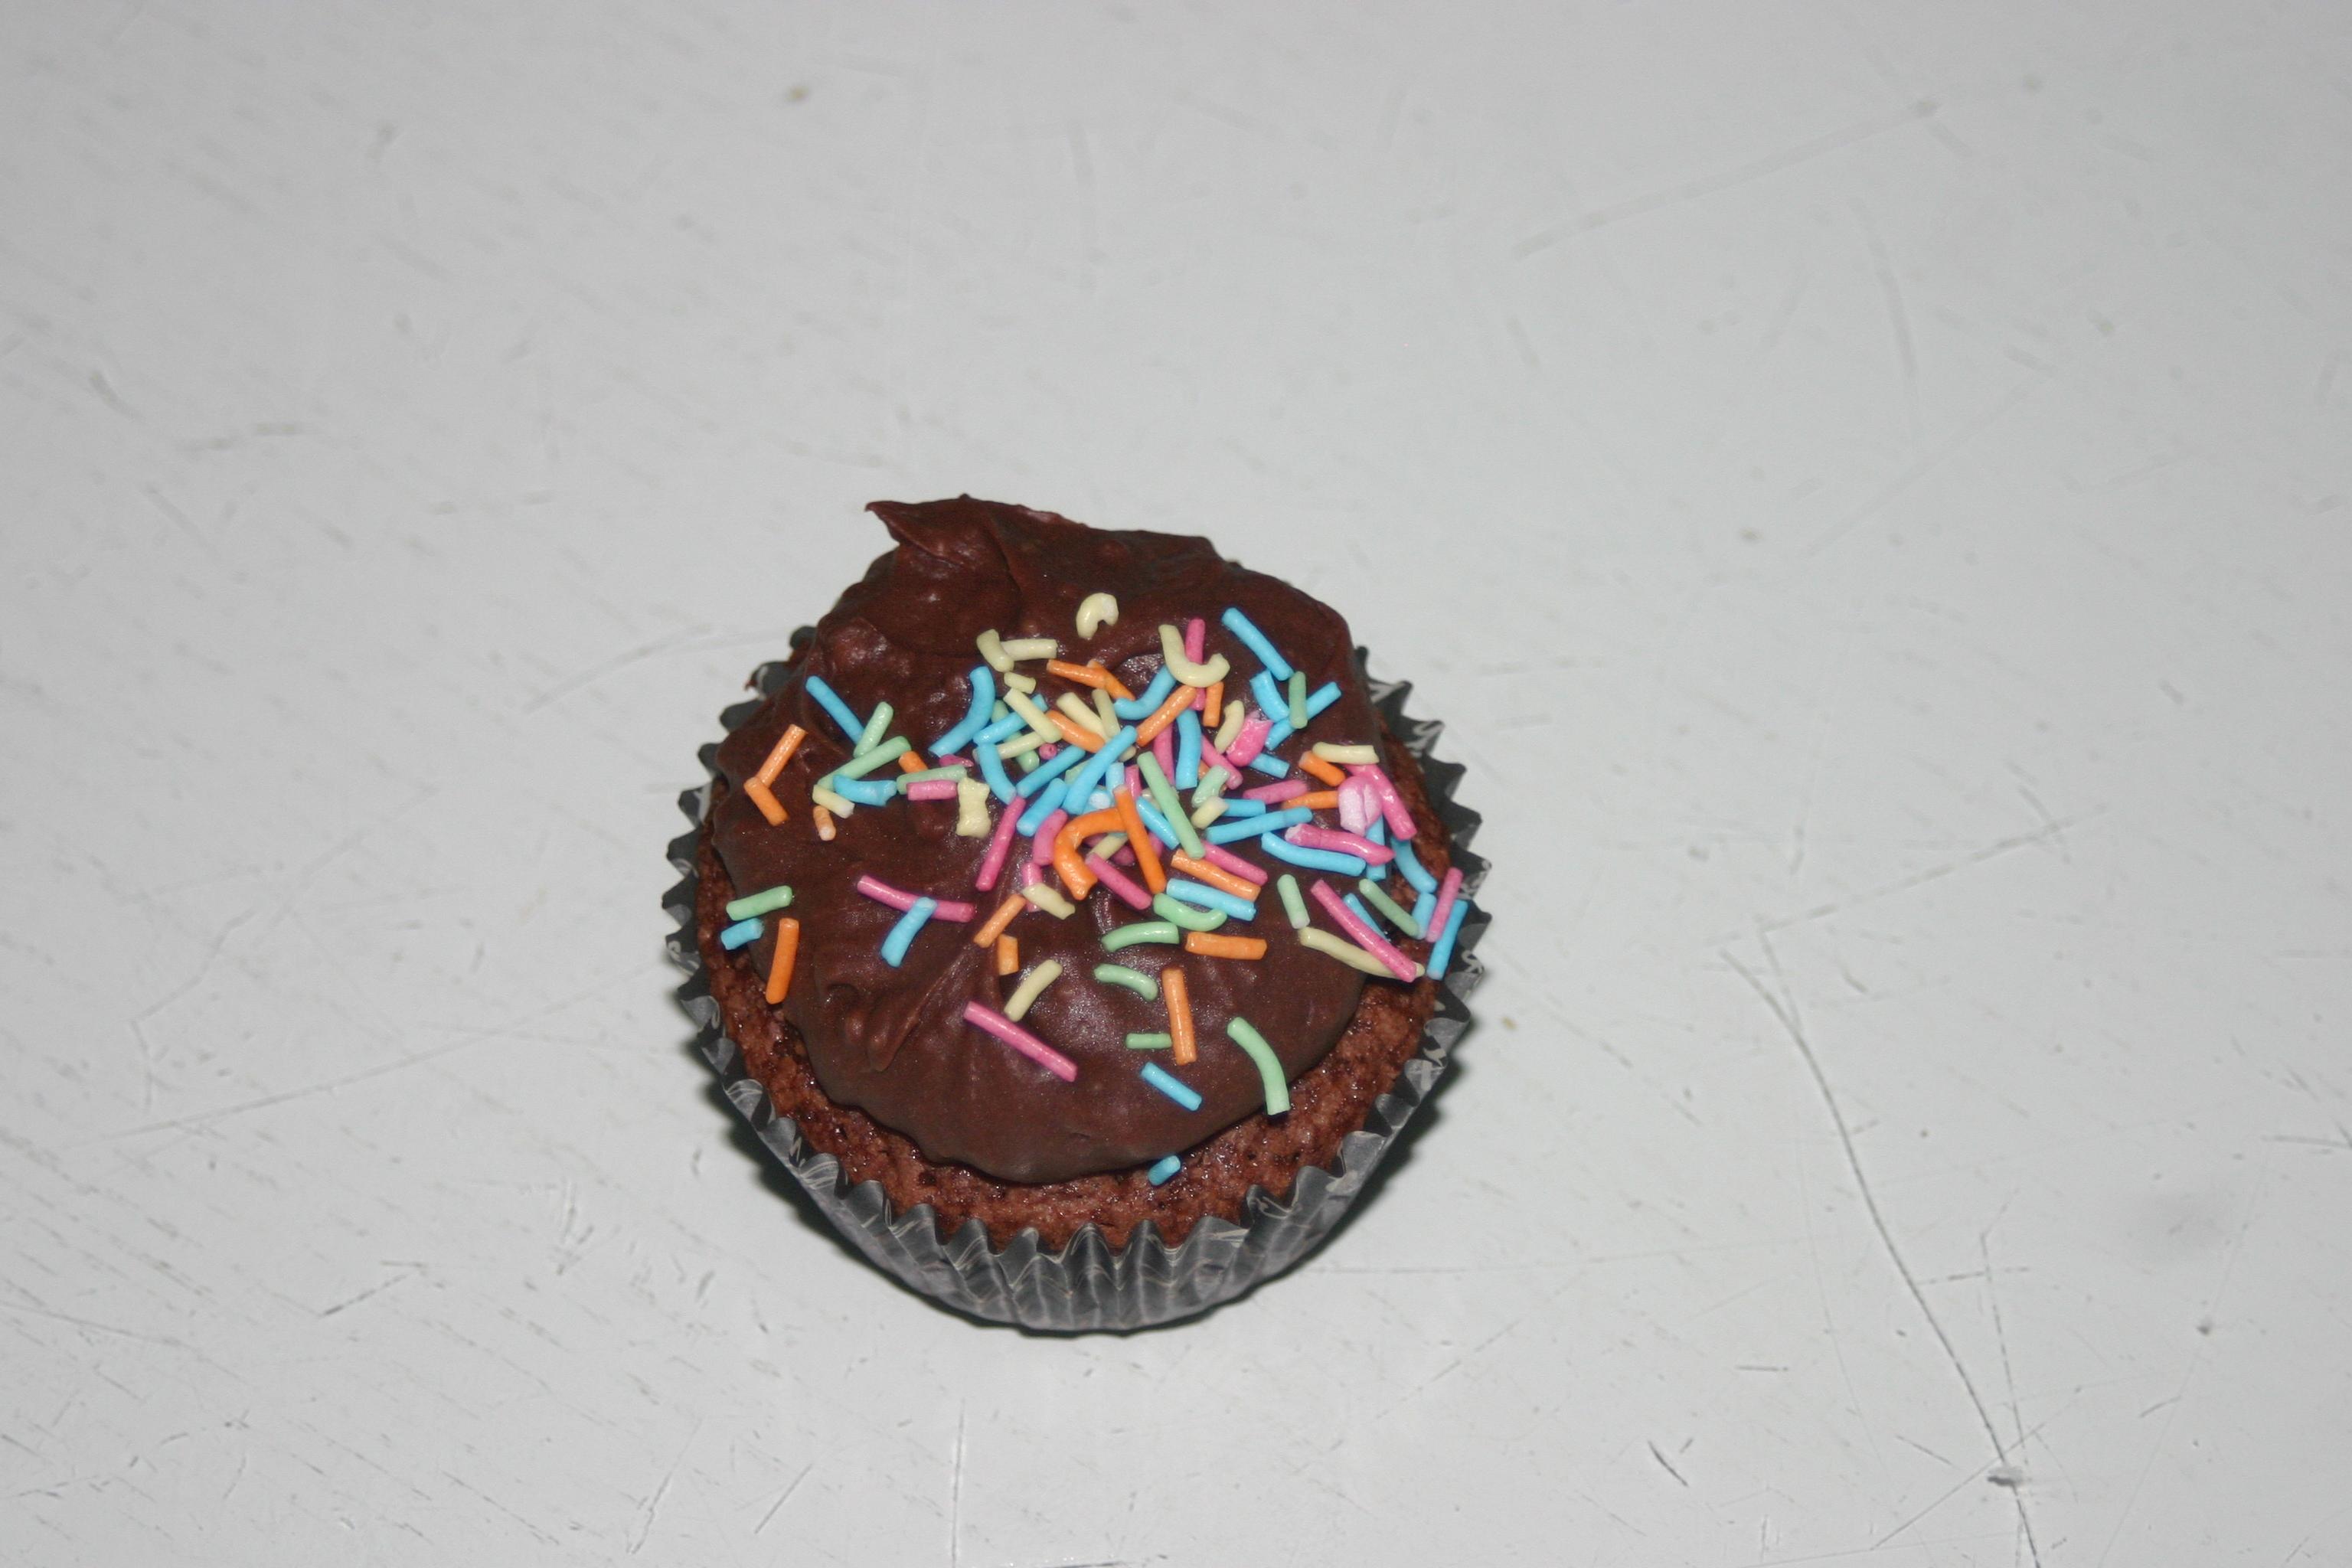 Söta små chokladcupcakes